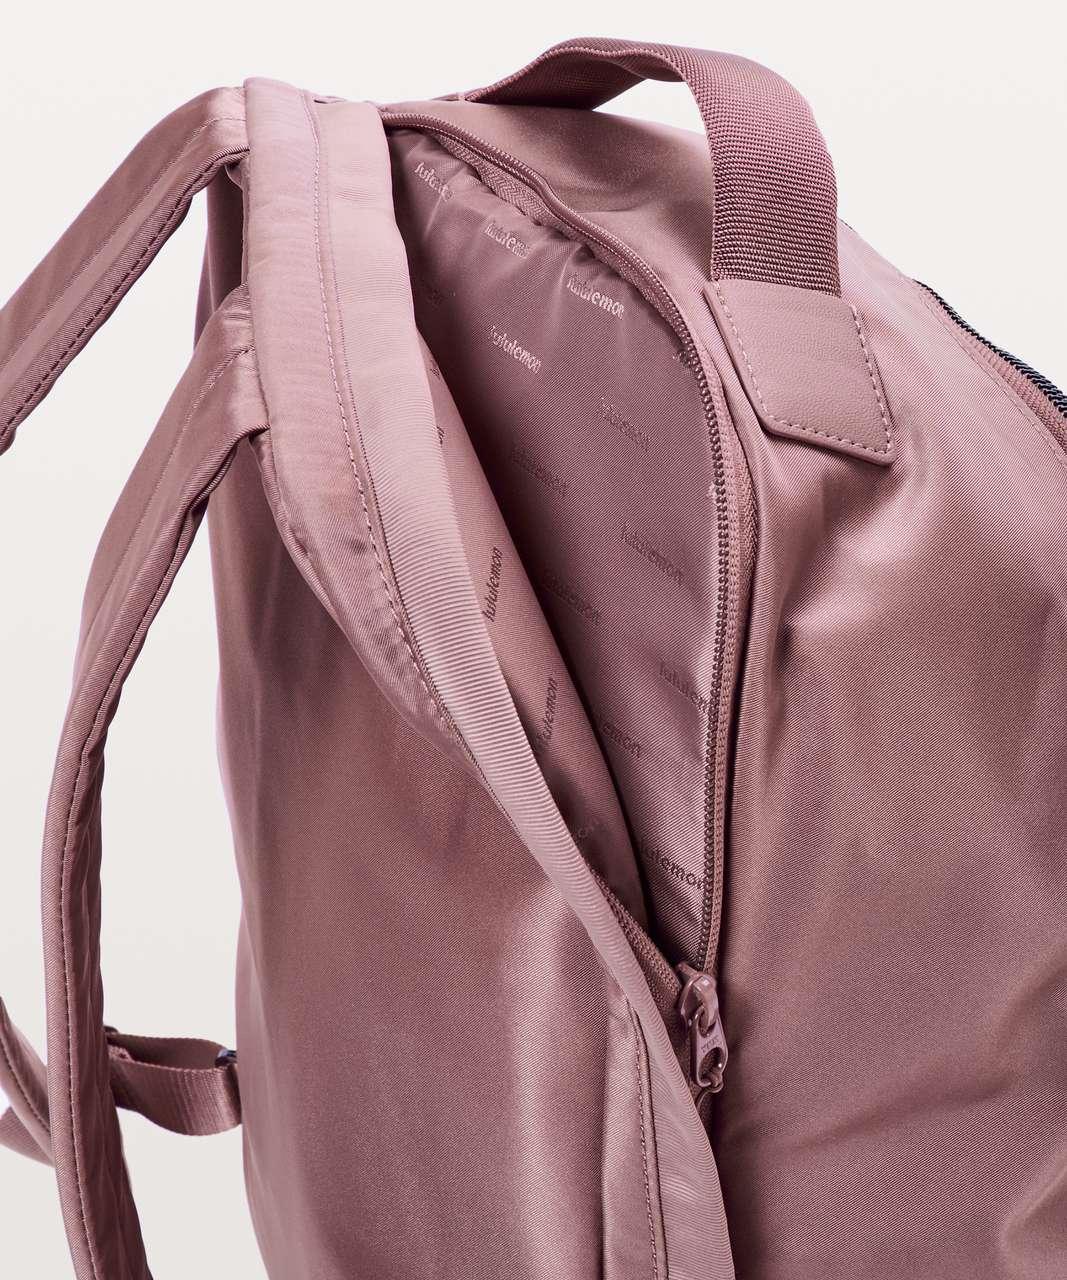 Lululemon City Adventurer Backpack II *17L - Red Dust